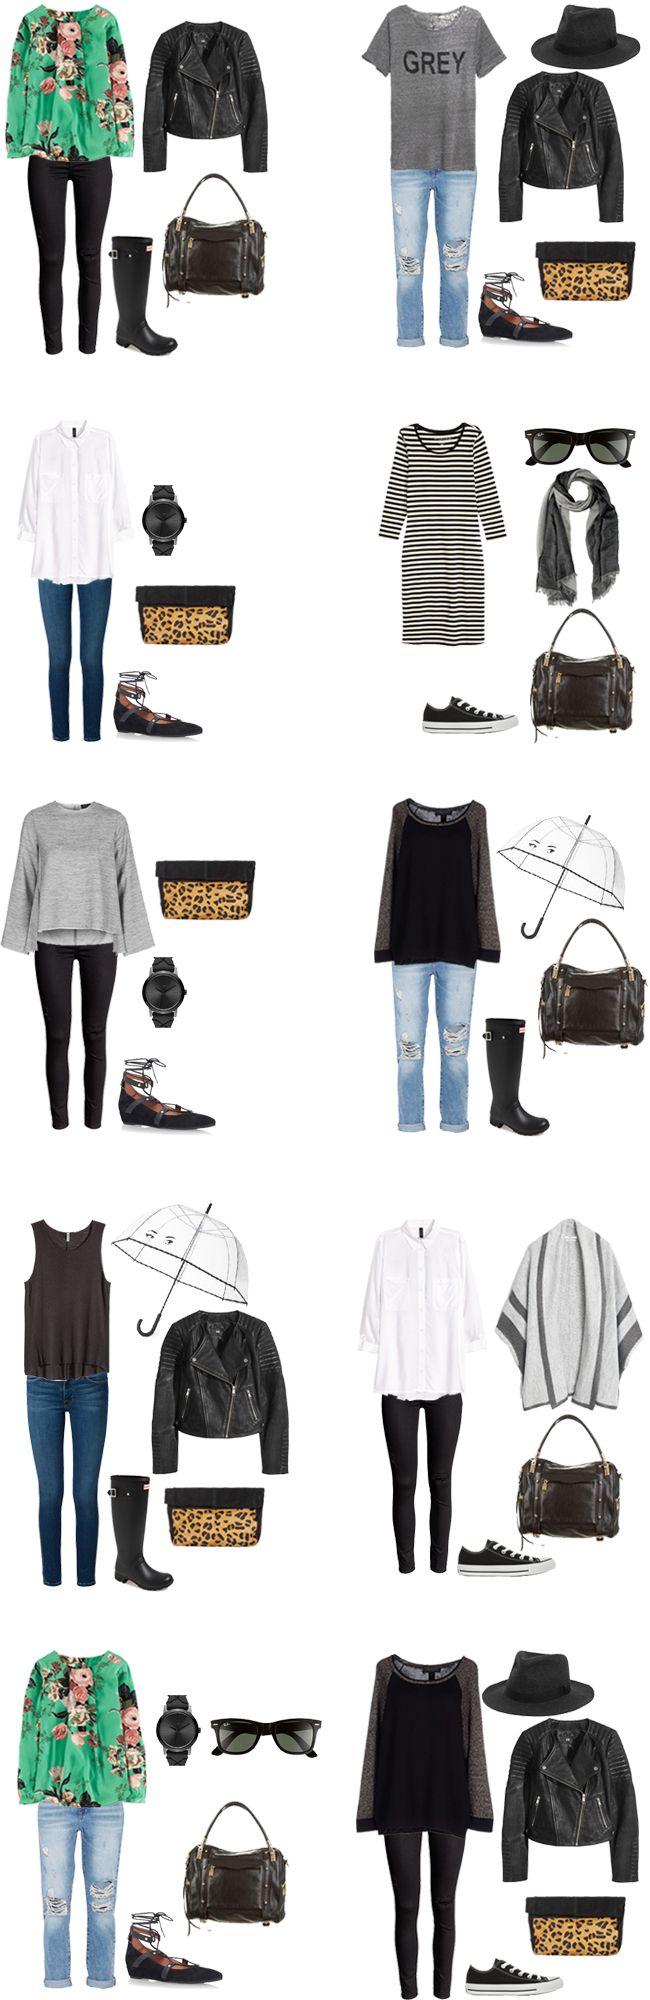 Outfit 1 – Black Tank | Boyfriend Jeans | Cardigan | Purse | Converse Outfit 2 – Grey Pullover | Dark Denim | Sunglasses | Watch | Purse | Flats Outfit 3 – T-shirt | Black Pants | Umbrella |… Continue Reading →